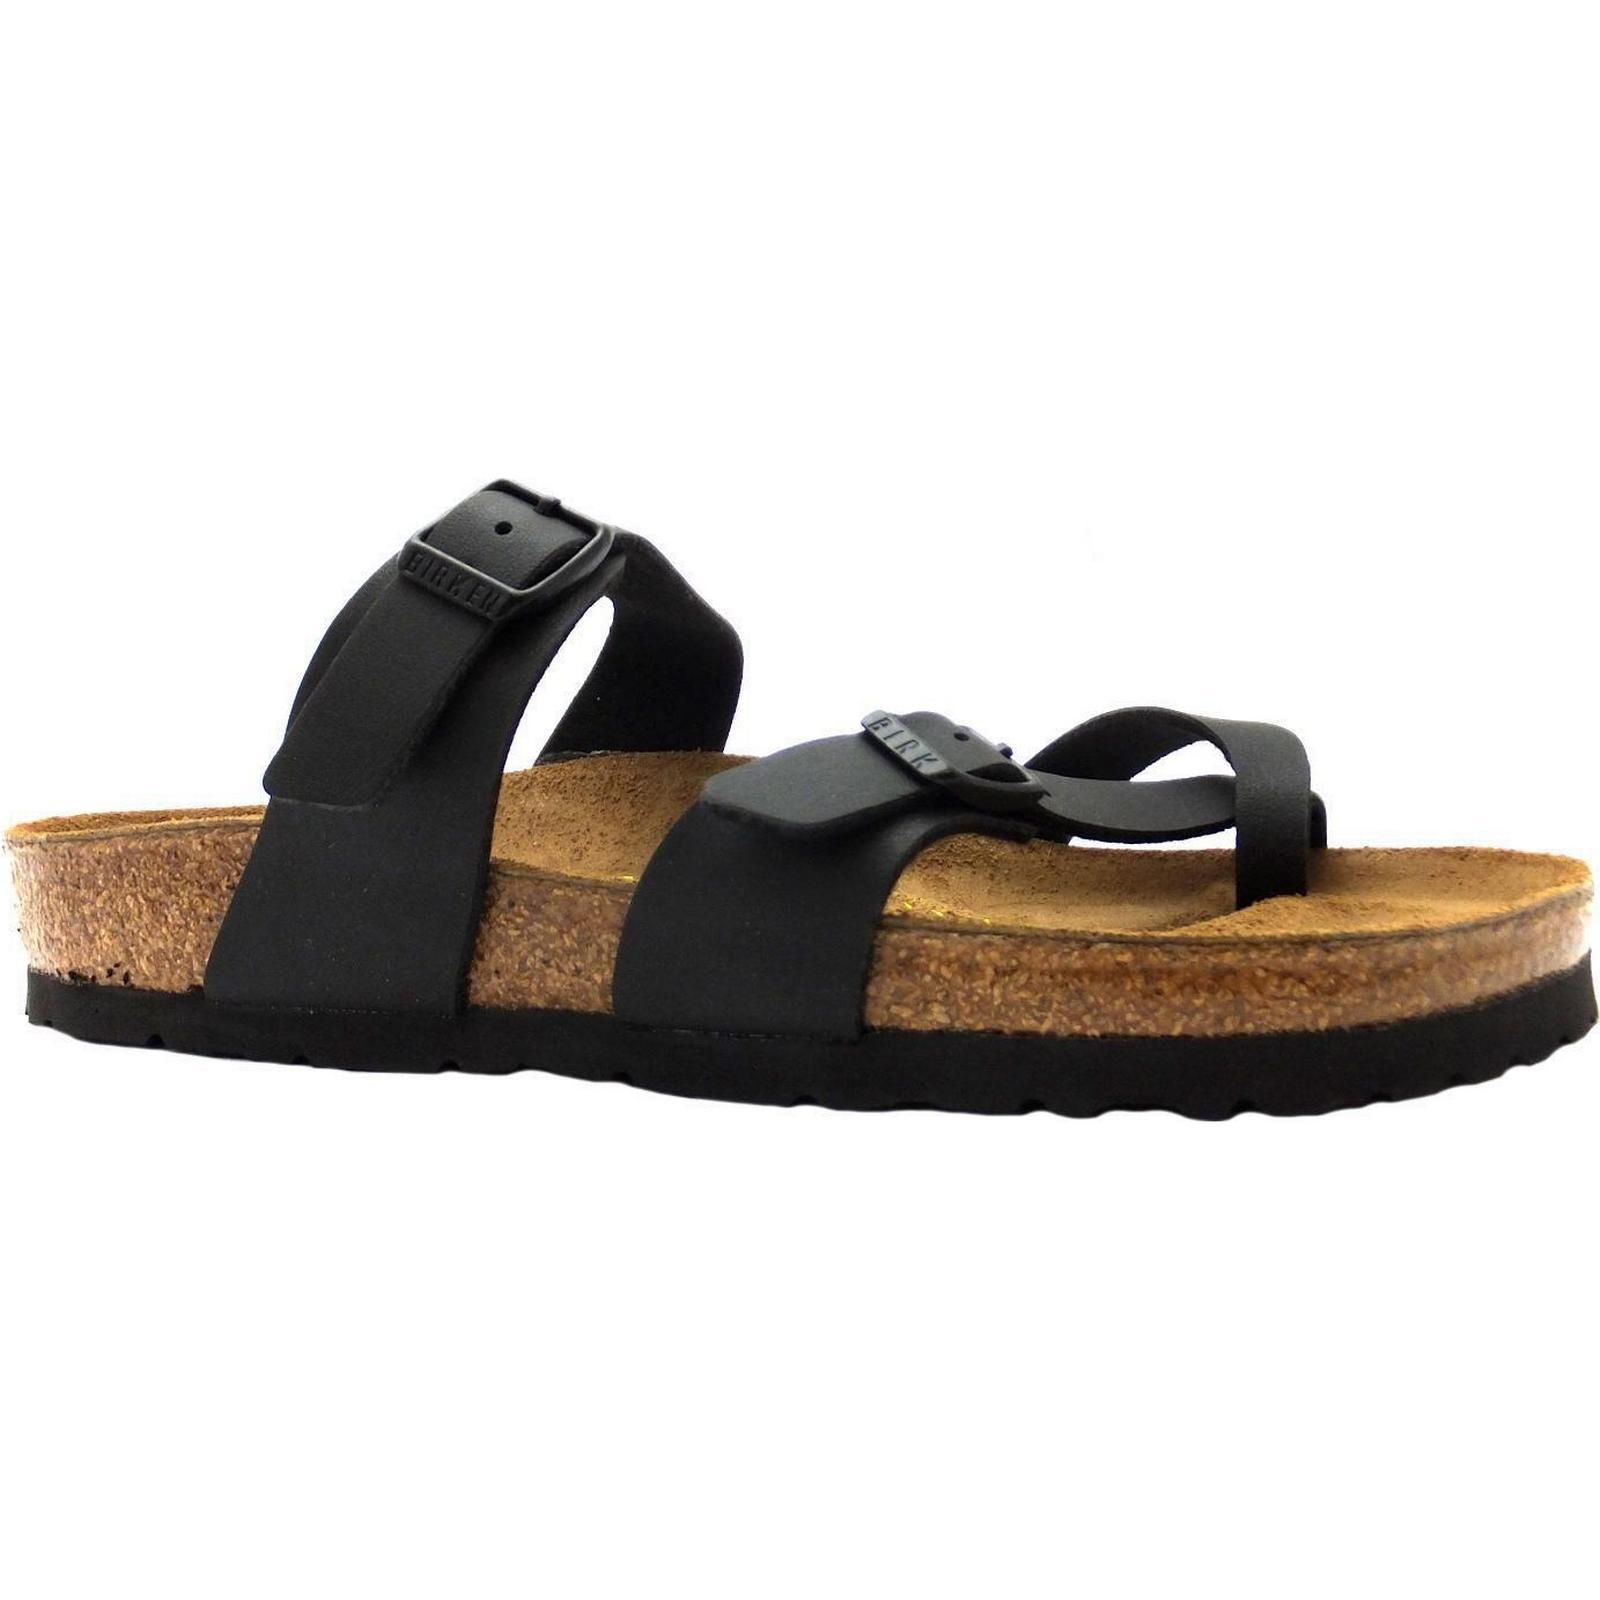 Mr/Ms:Birkenstock Mayari Strappy Sandals:Latest Technology Technology Technology 87434e